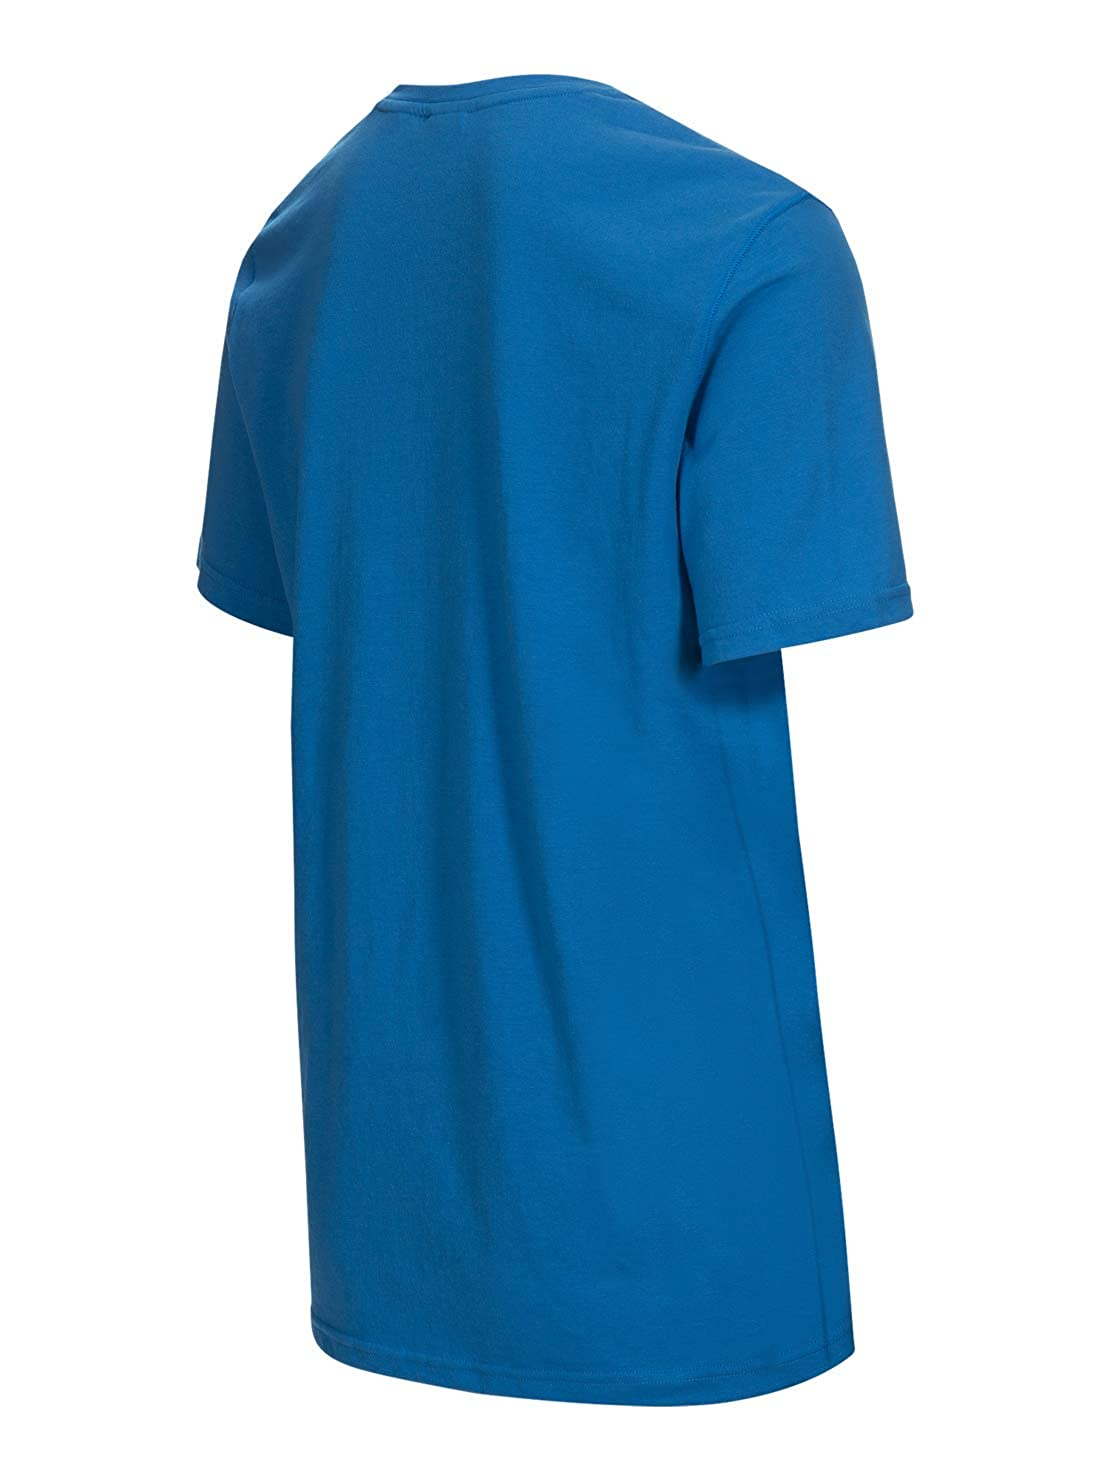 Peak Performance Herren Track t-Shirt Funktionsshirt neu